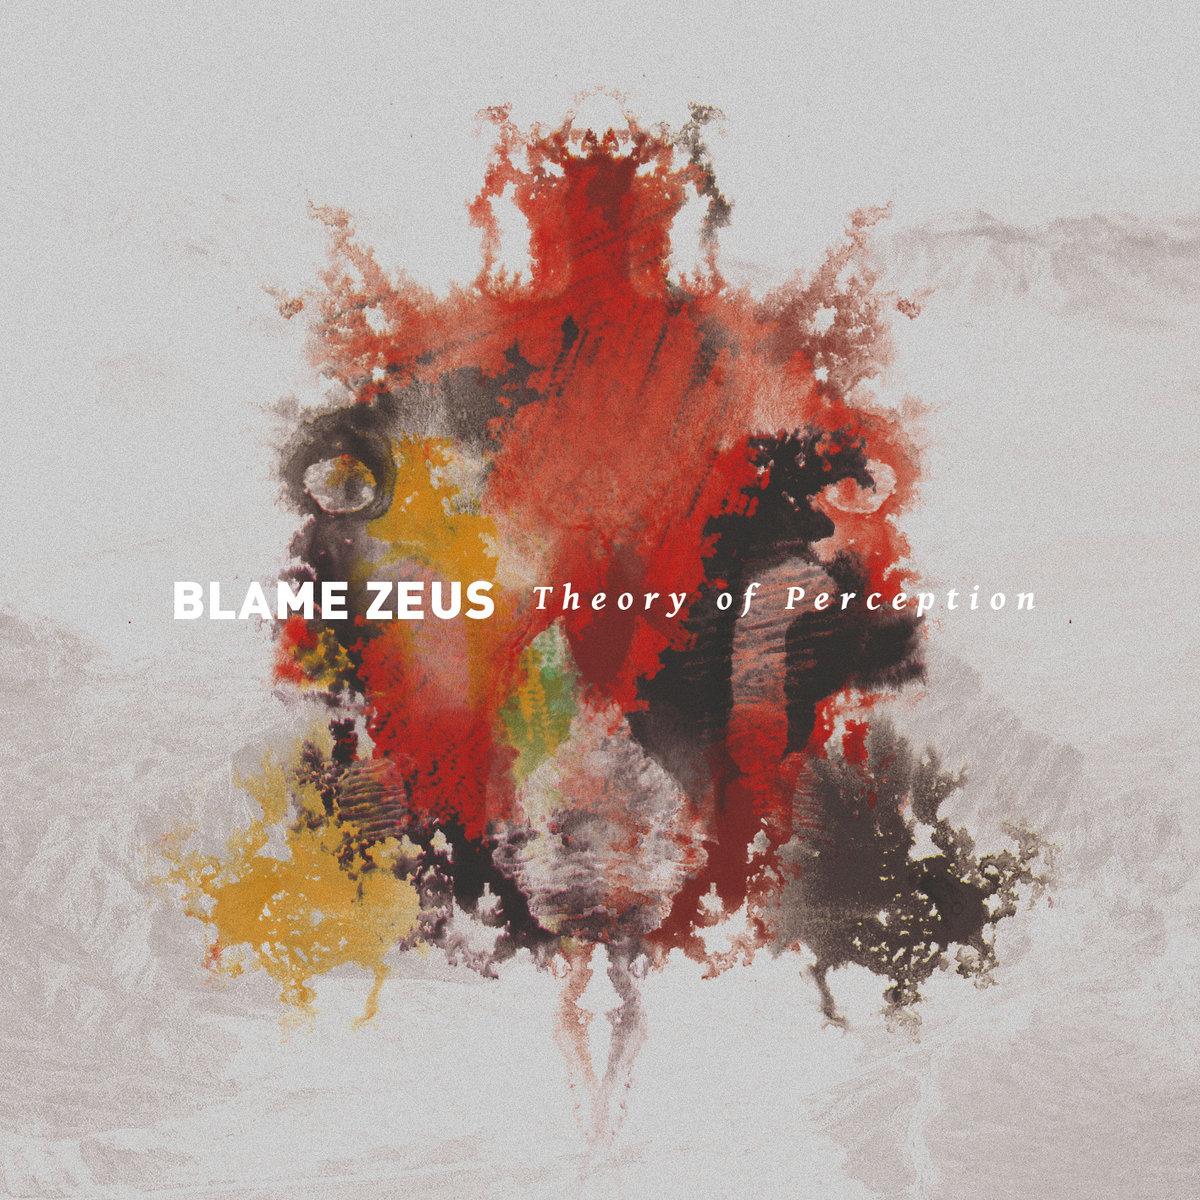 by Blame Zeus